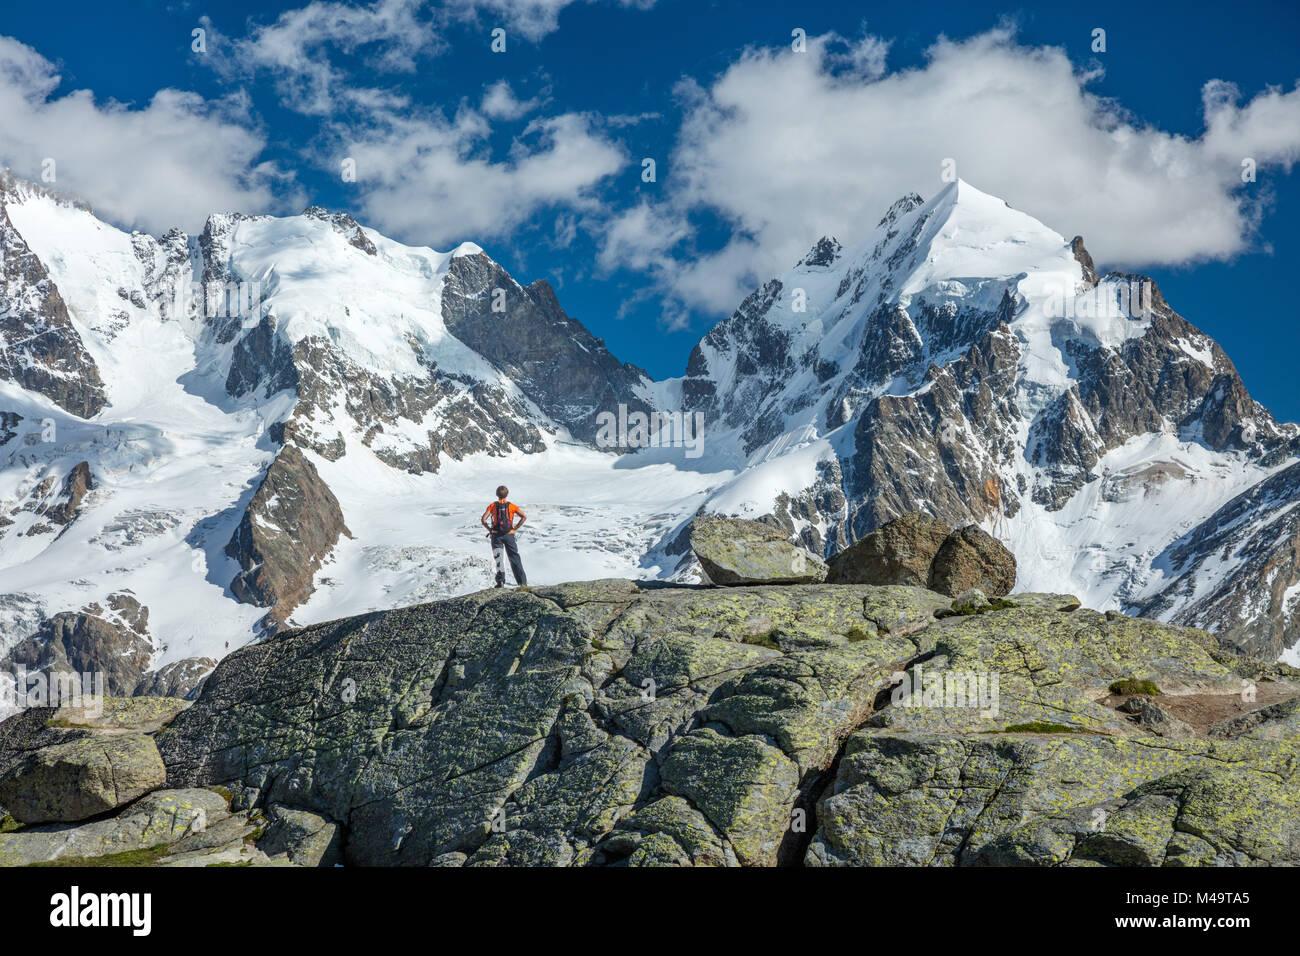 Hiker beneath Piz Bernina and Piz Rosbeg, Fuorcla Surlej, Berniner Alps, Graubunden, Switzerland. - Stock Image